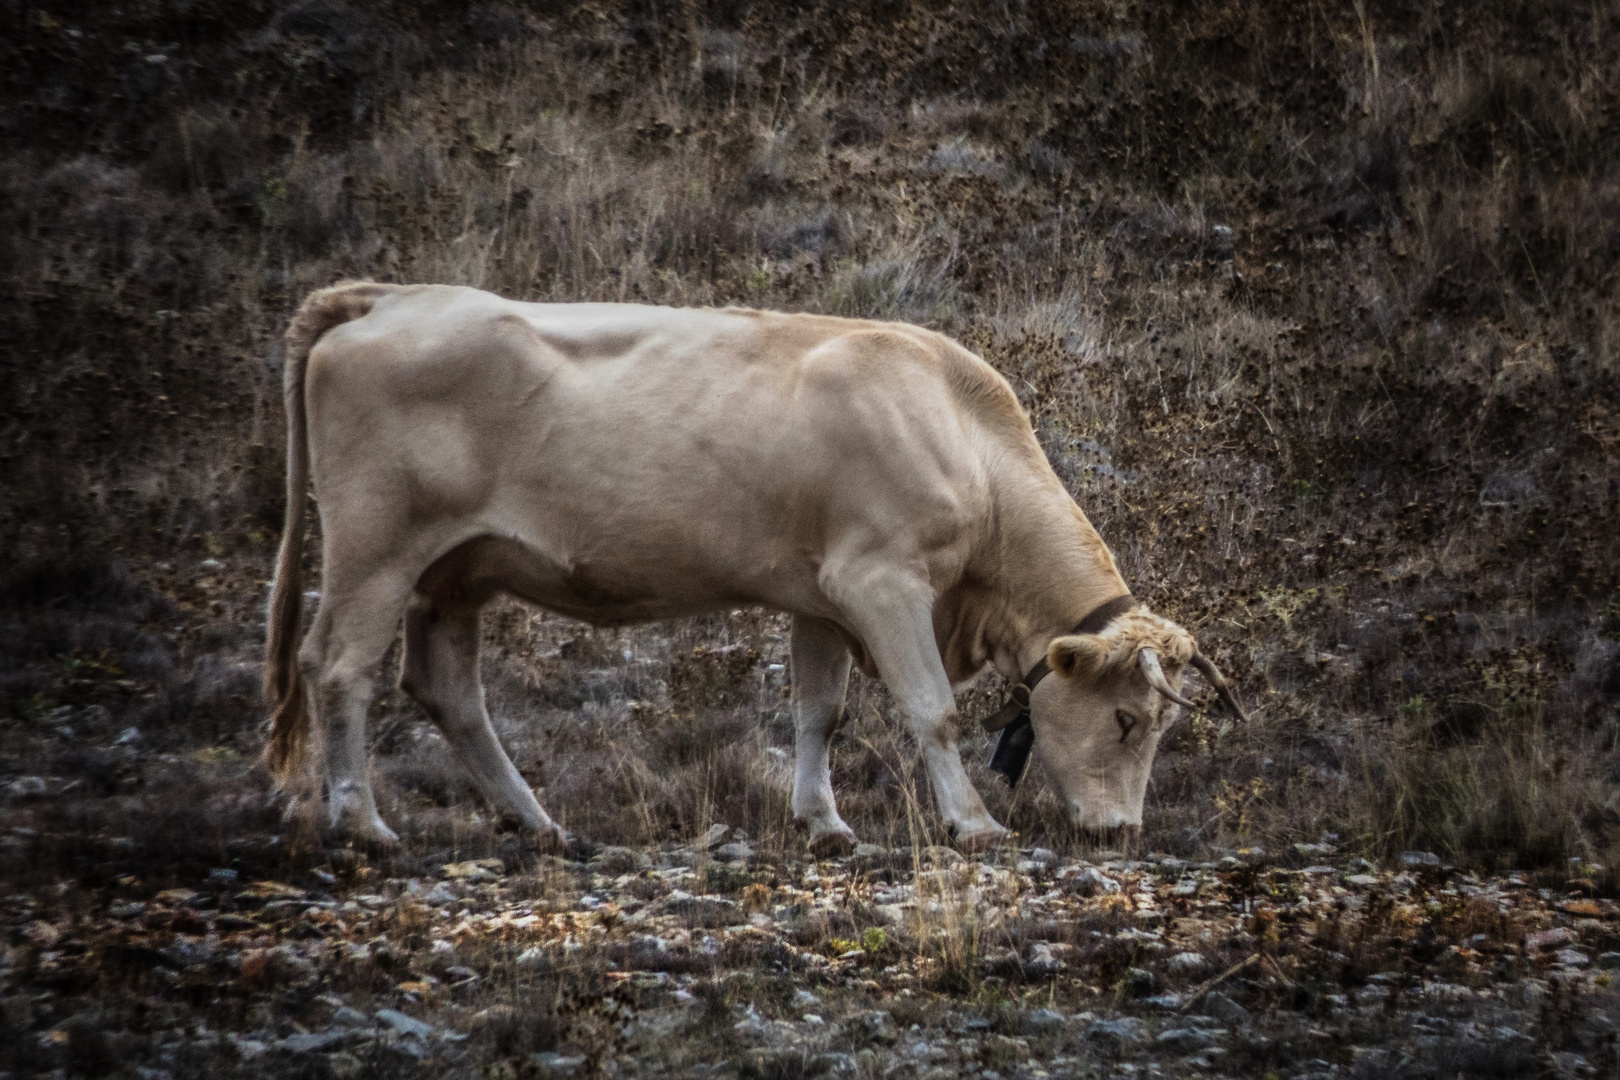 Vaca feliz - Happy cow (Animal feelings)